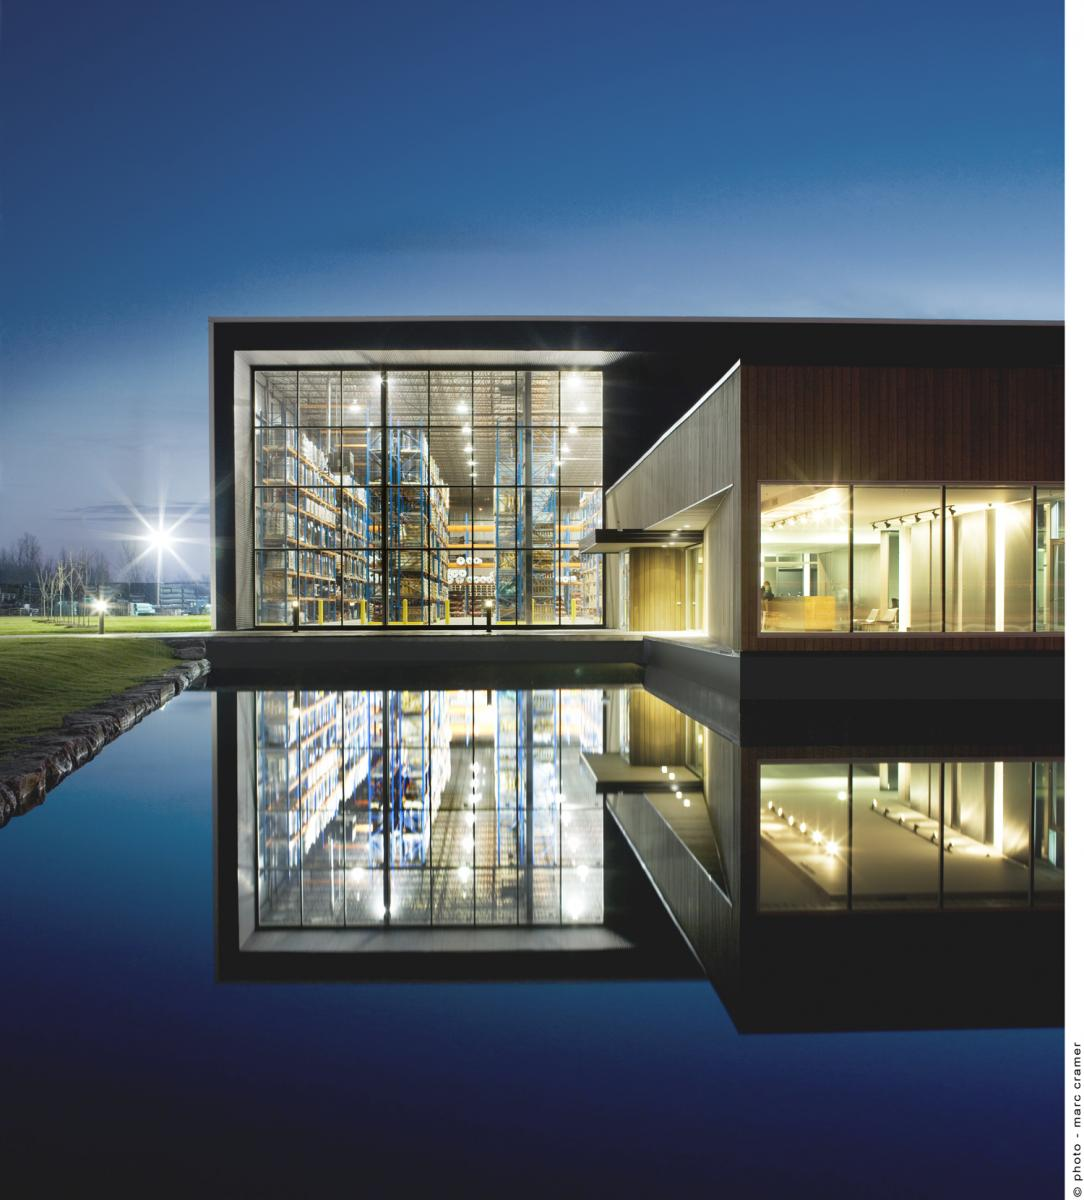 Siège Social De Saint Germain égouts Et Aqueducs, Saint Hubert, Québec,. AR  Architecture; IN Interior Design ...